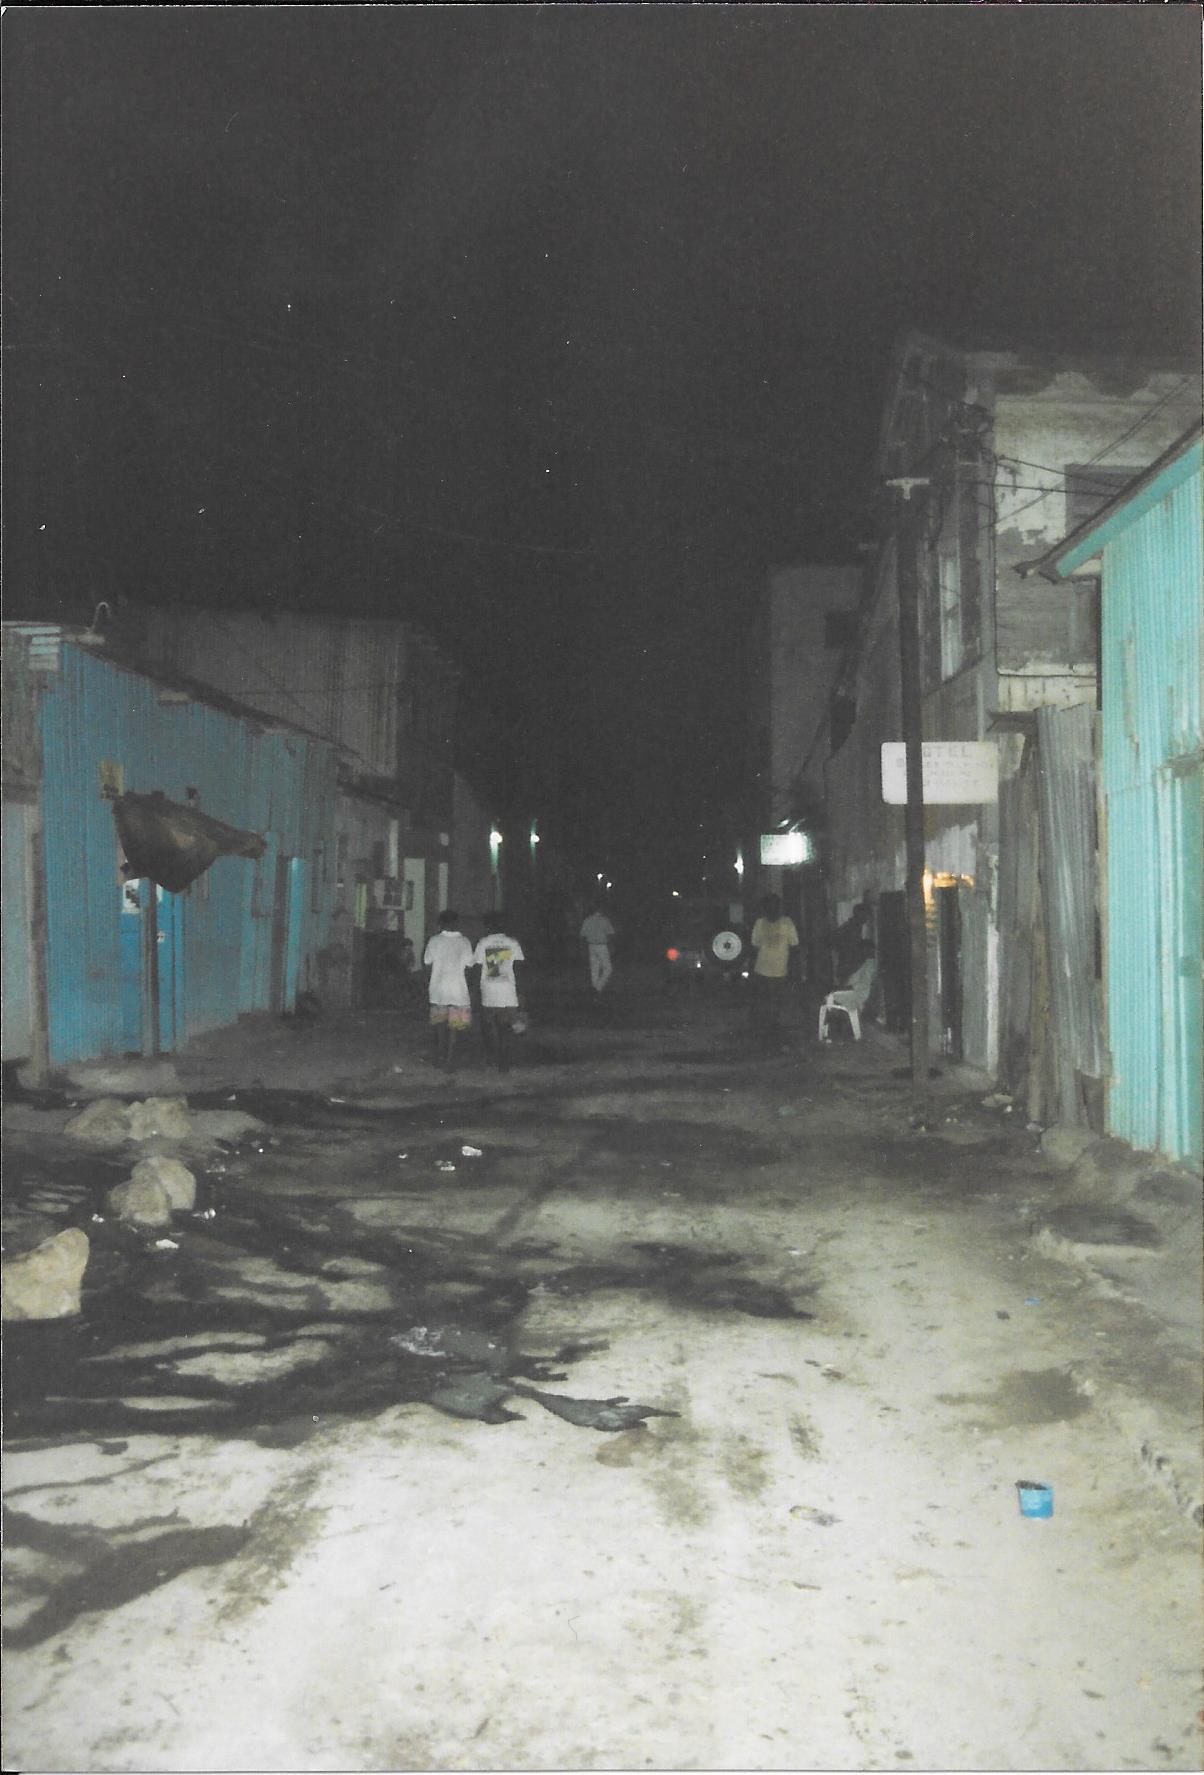 [Campagne] DJIBOUTI - TOME 1 - Page 22 311